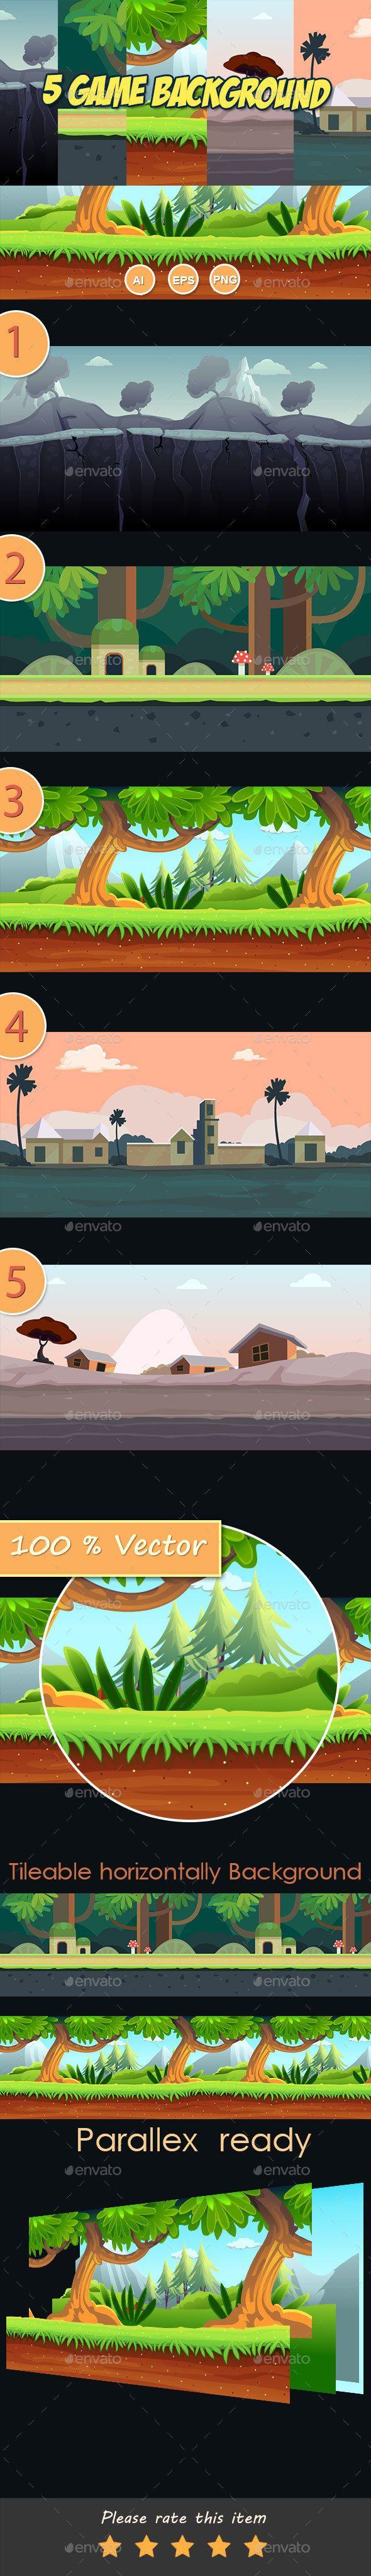 5 level Cartoon Game Background (Backgrounds)